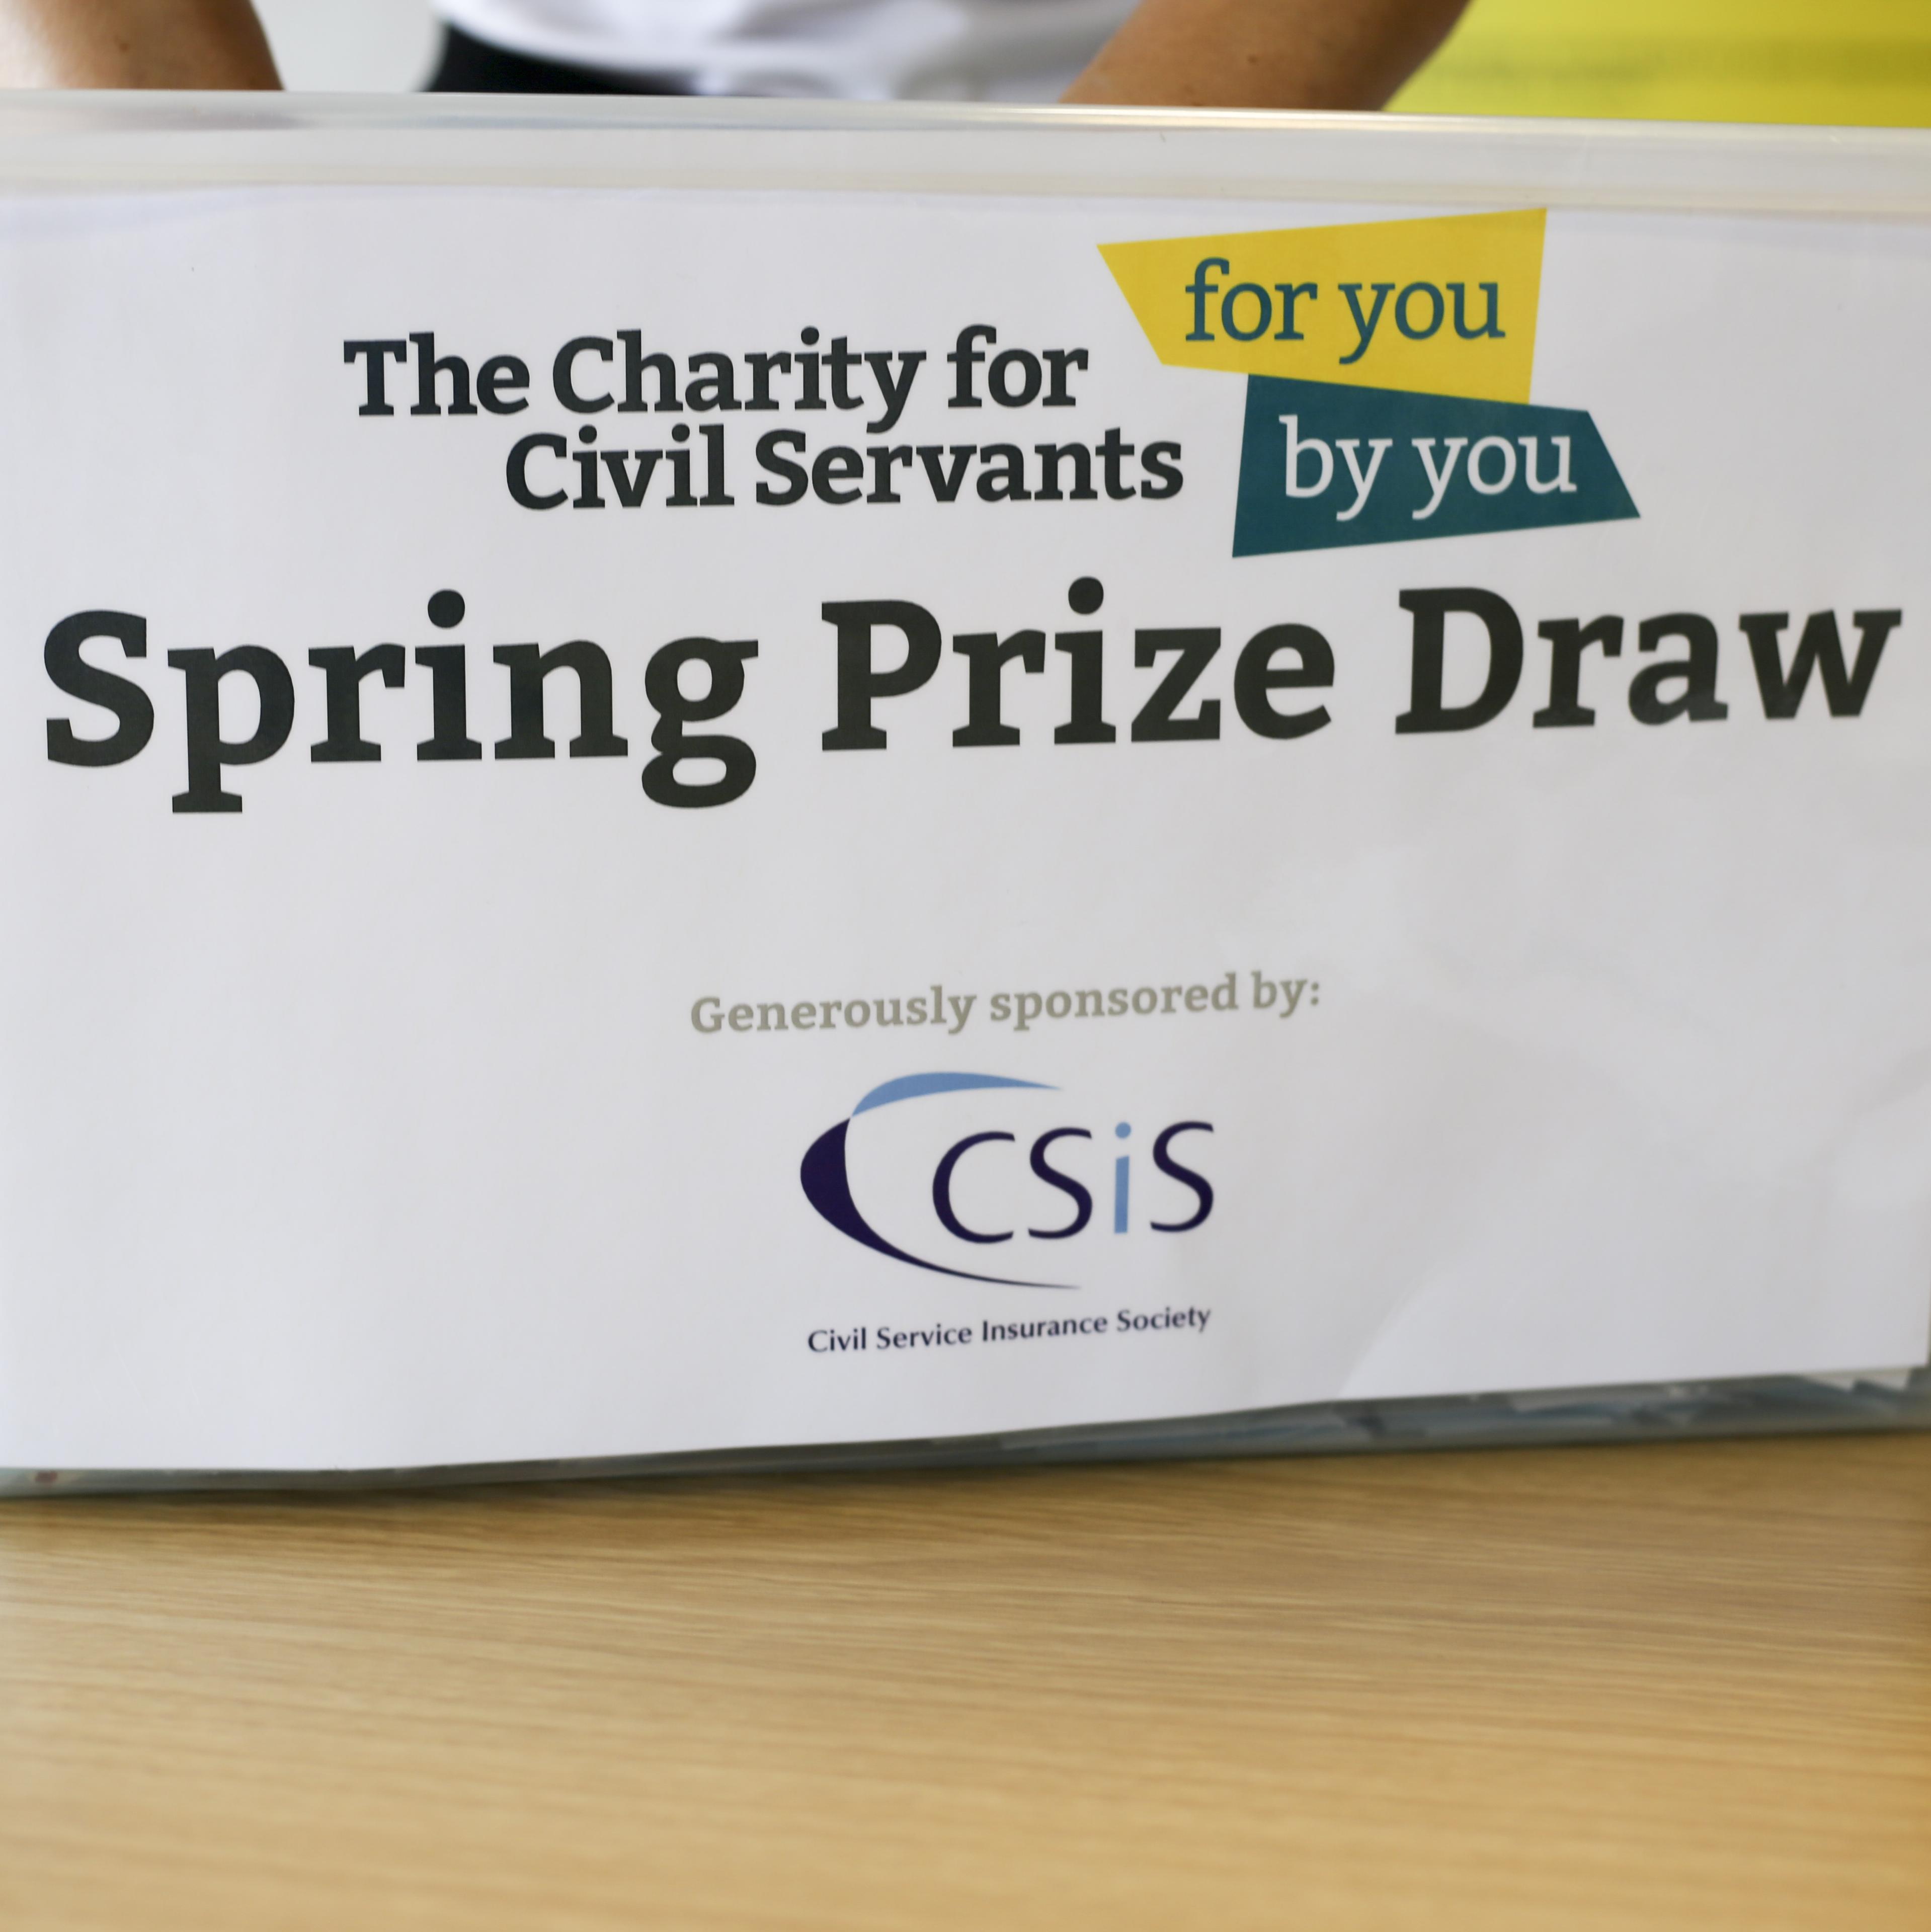 Spring Prize Draw